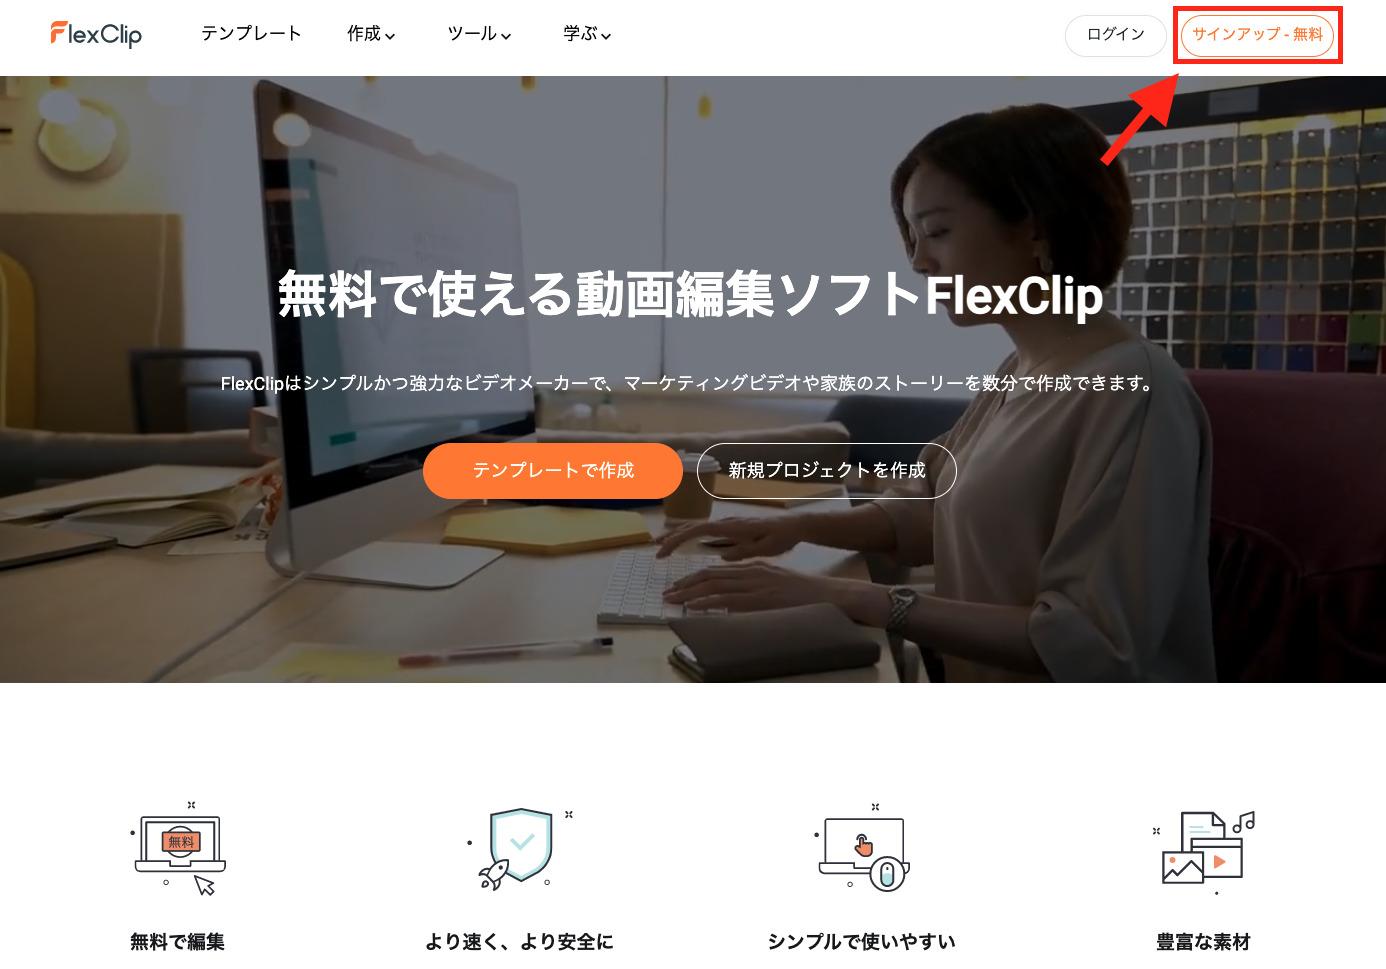 FlexClip公式ページ